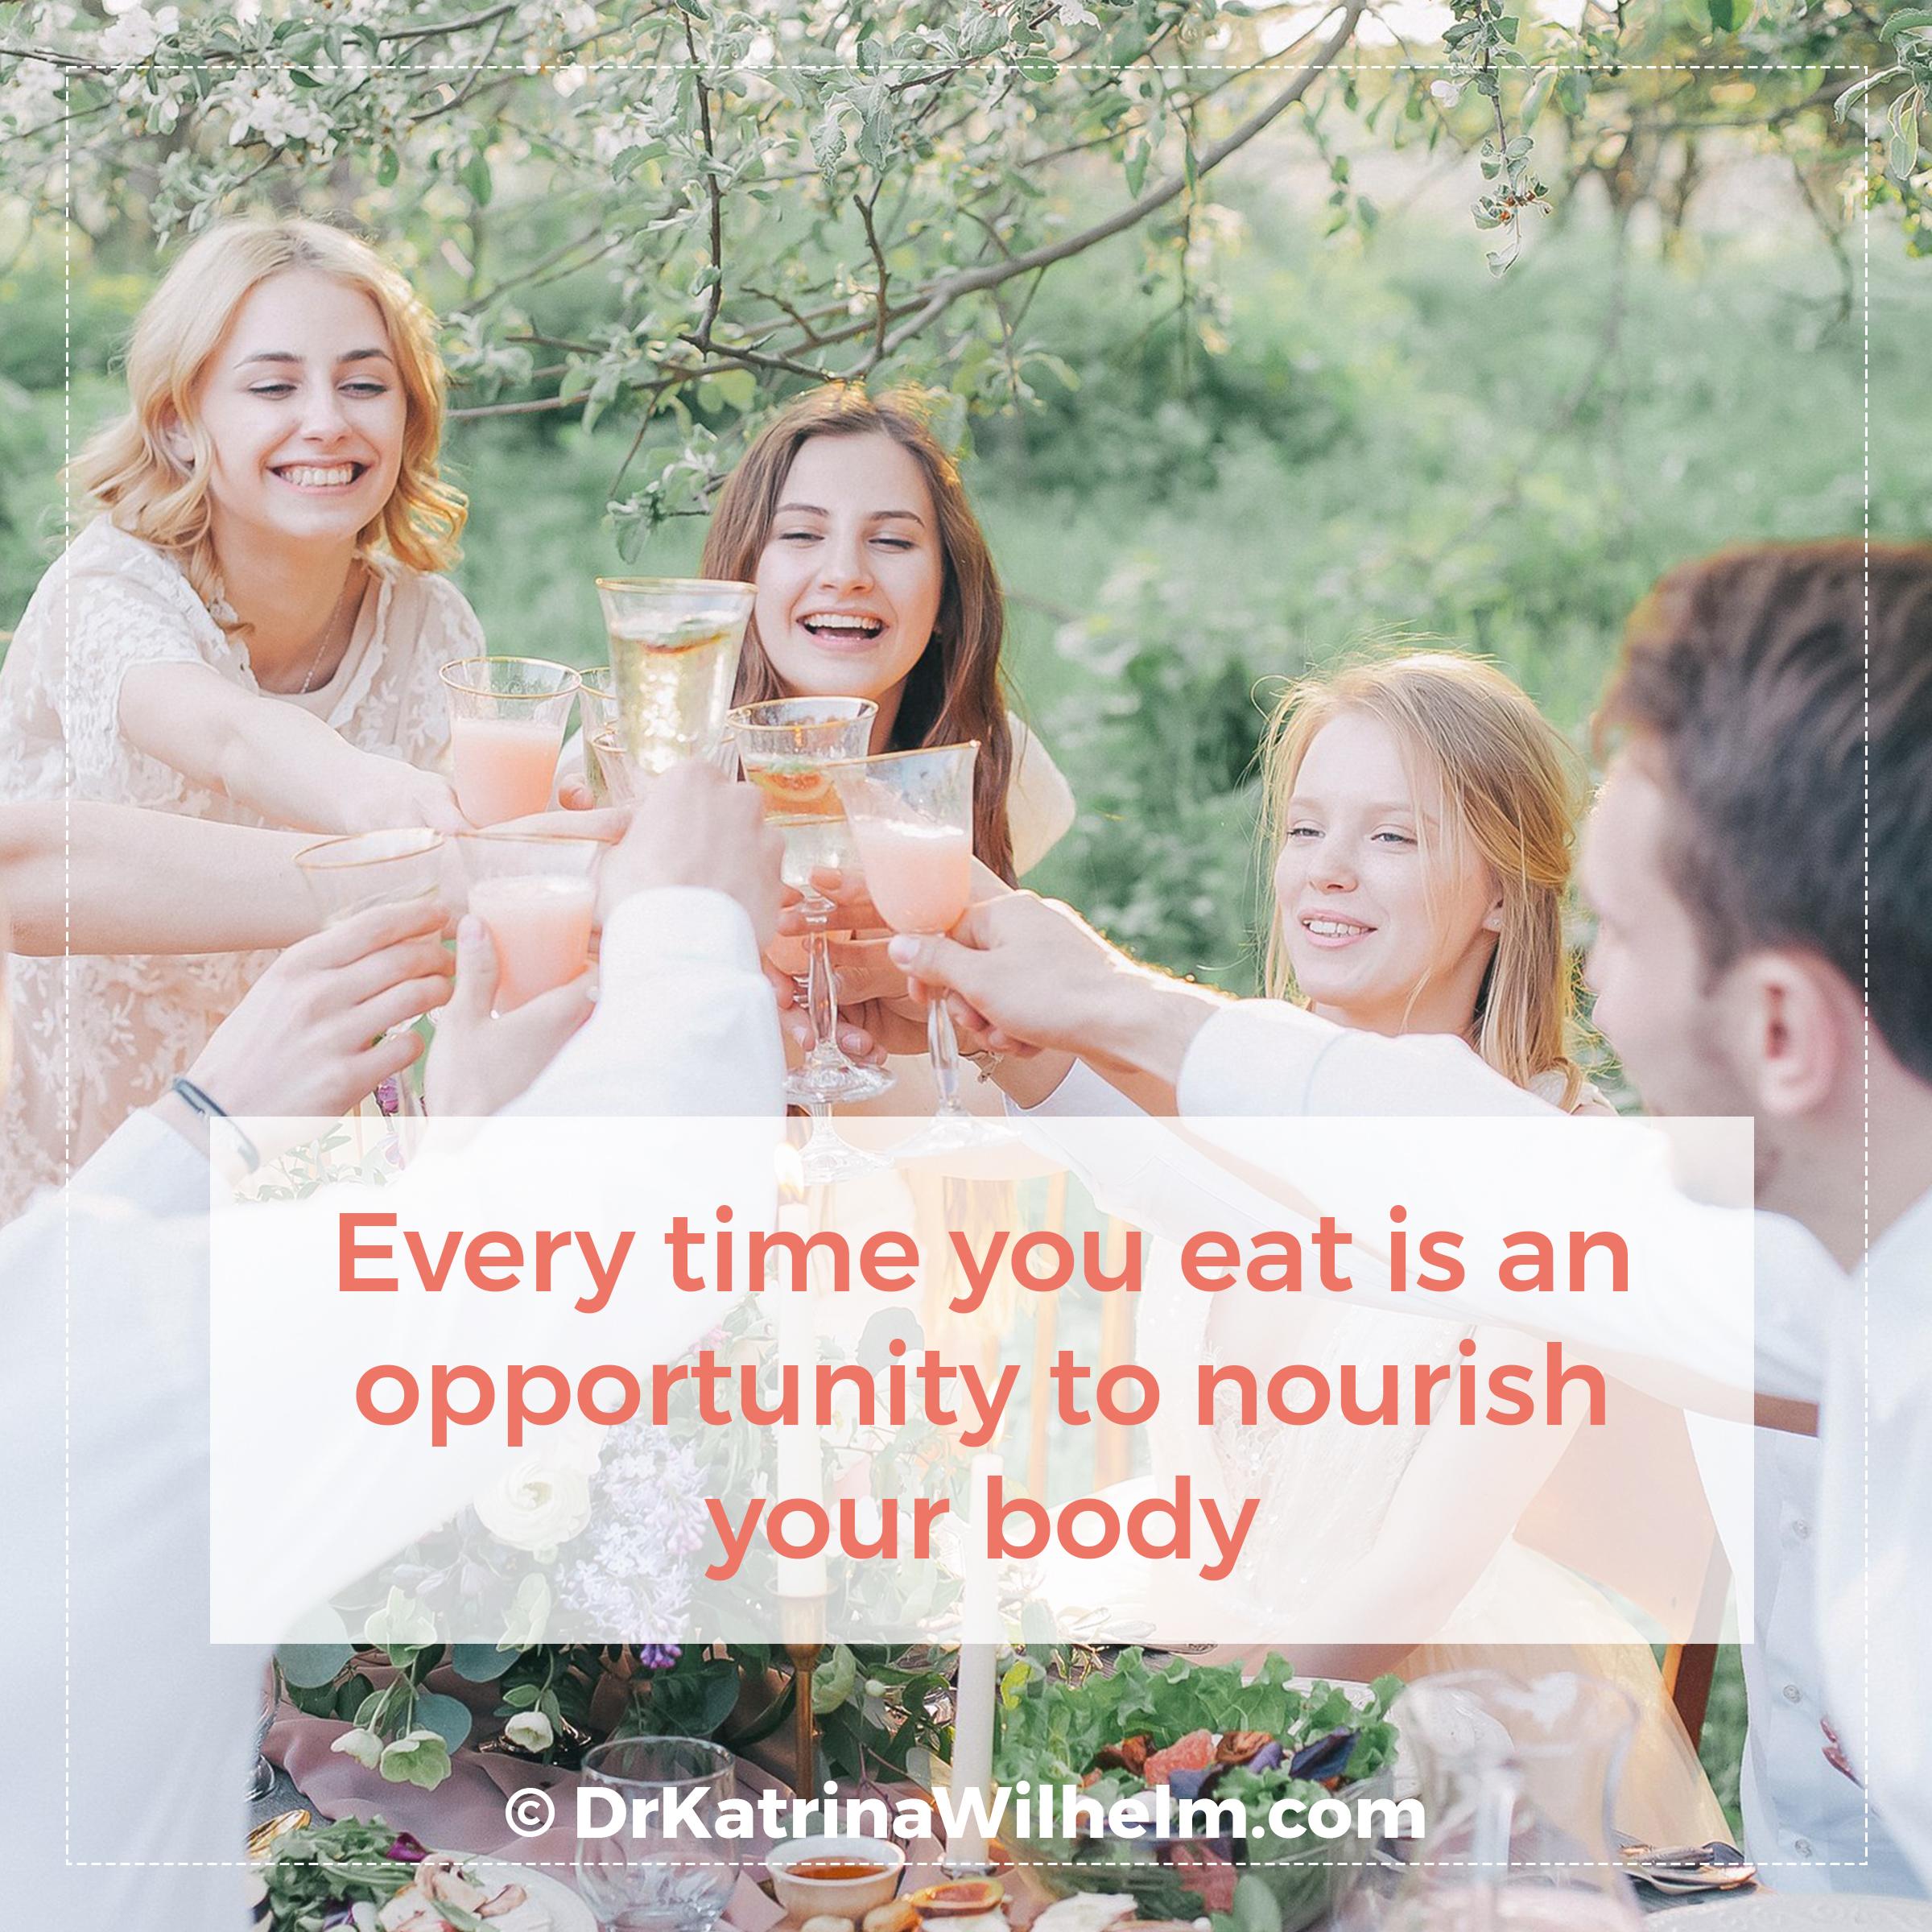 DKW healthy inspirational motivational quotes diet-10b.jpg